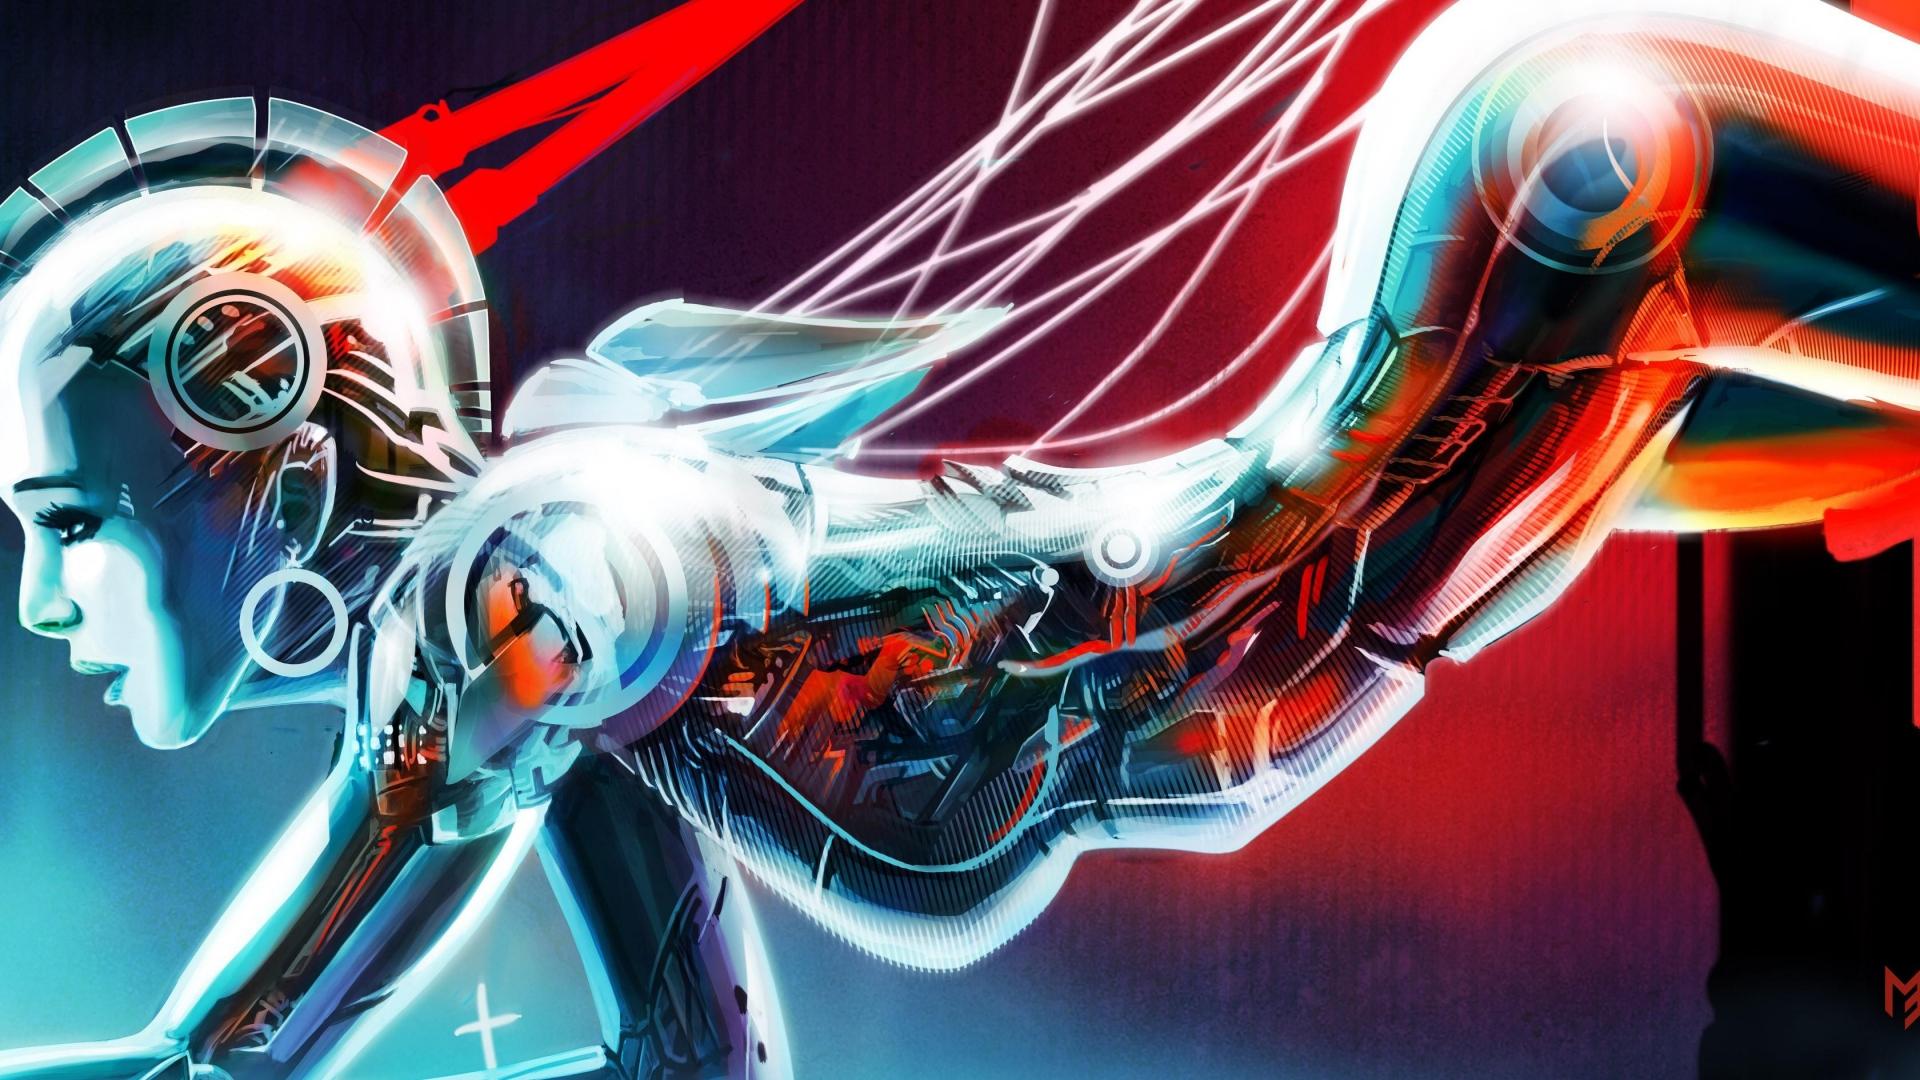 14+ Anime Girl Robot Wallpaper - Michi Wallpaper